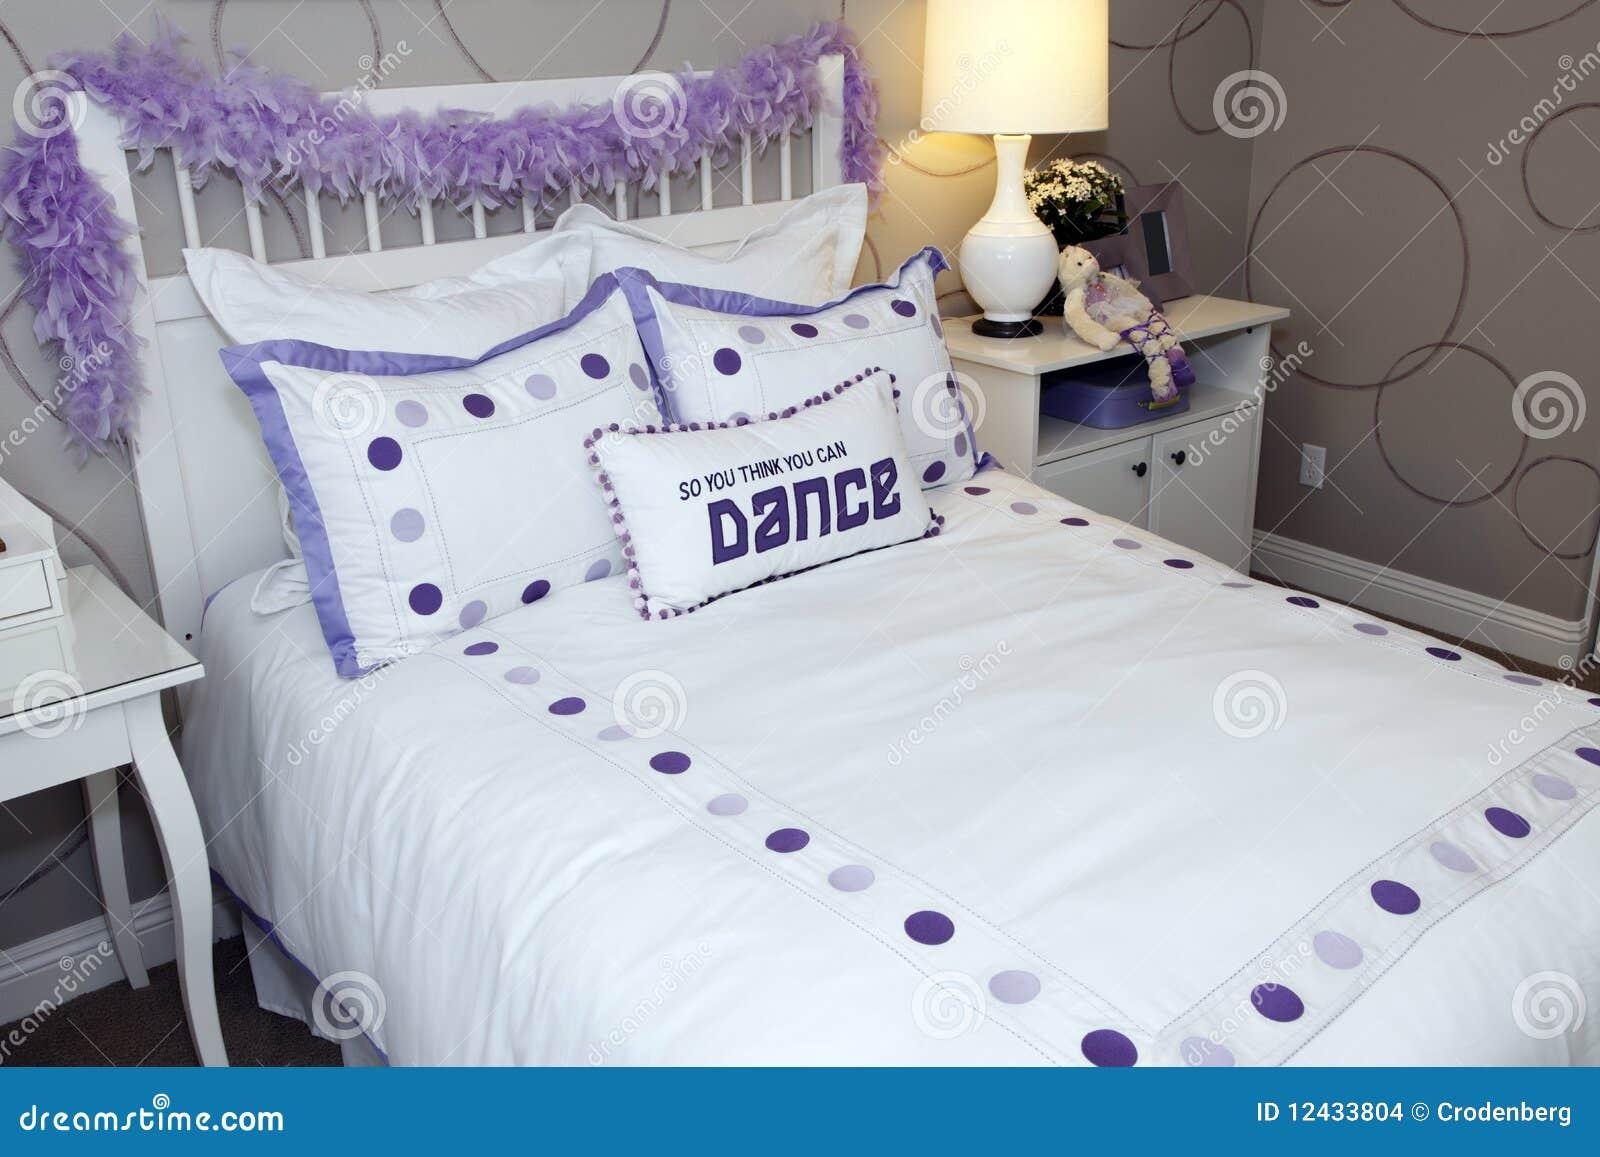 jugendliches schlafzimmer stockbilder bild 12433804. Black Bedroom Furniture Sets. Home Design Ideas